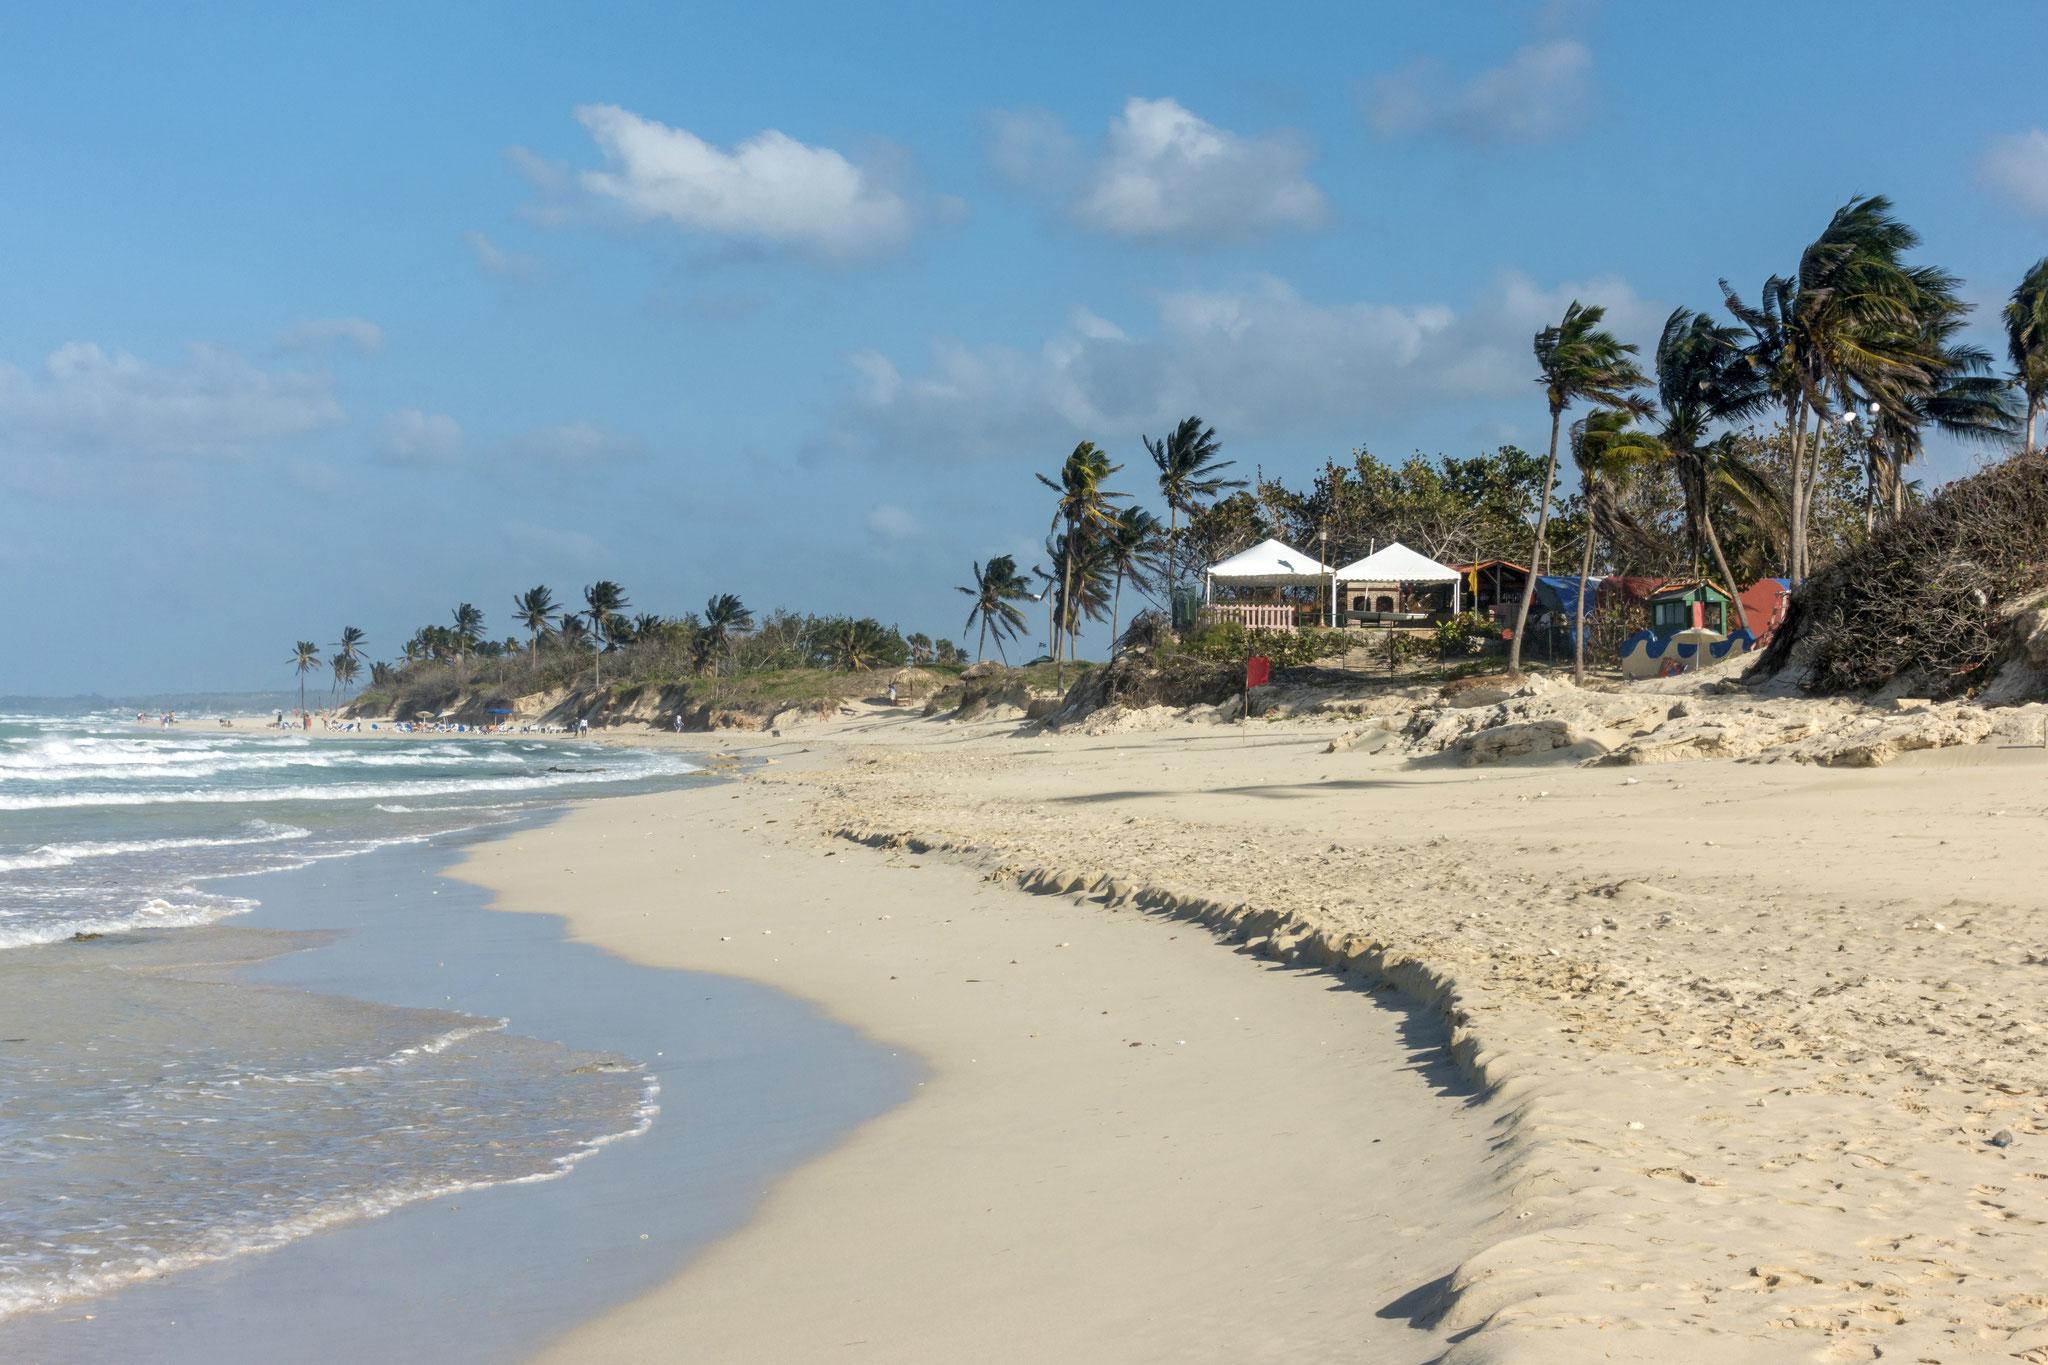 Playas del Este, wenige Kilometer von Havanna entfernt